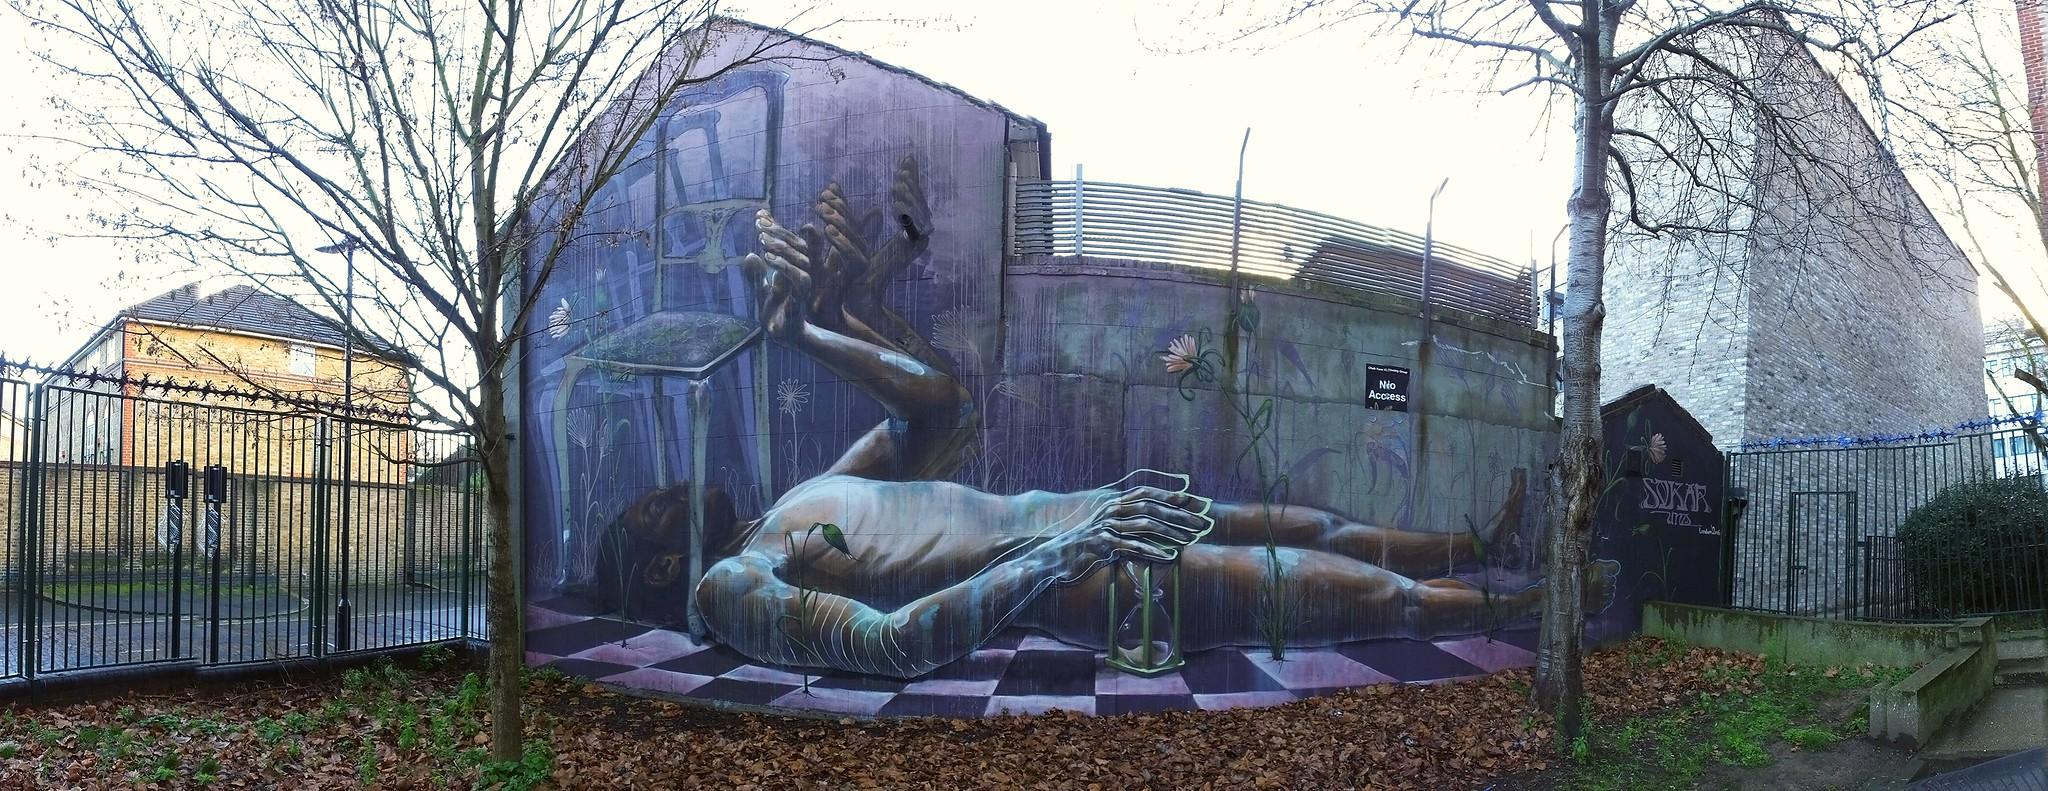 Camden Street Art by Sokar Uno